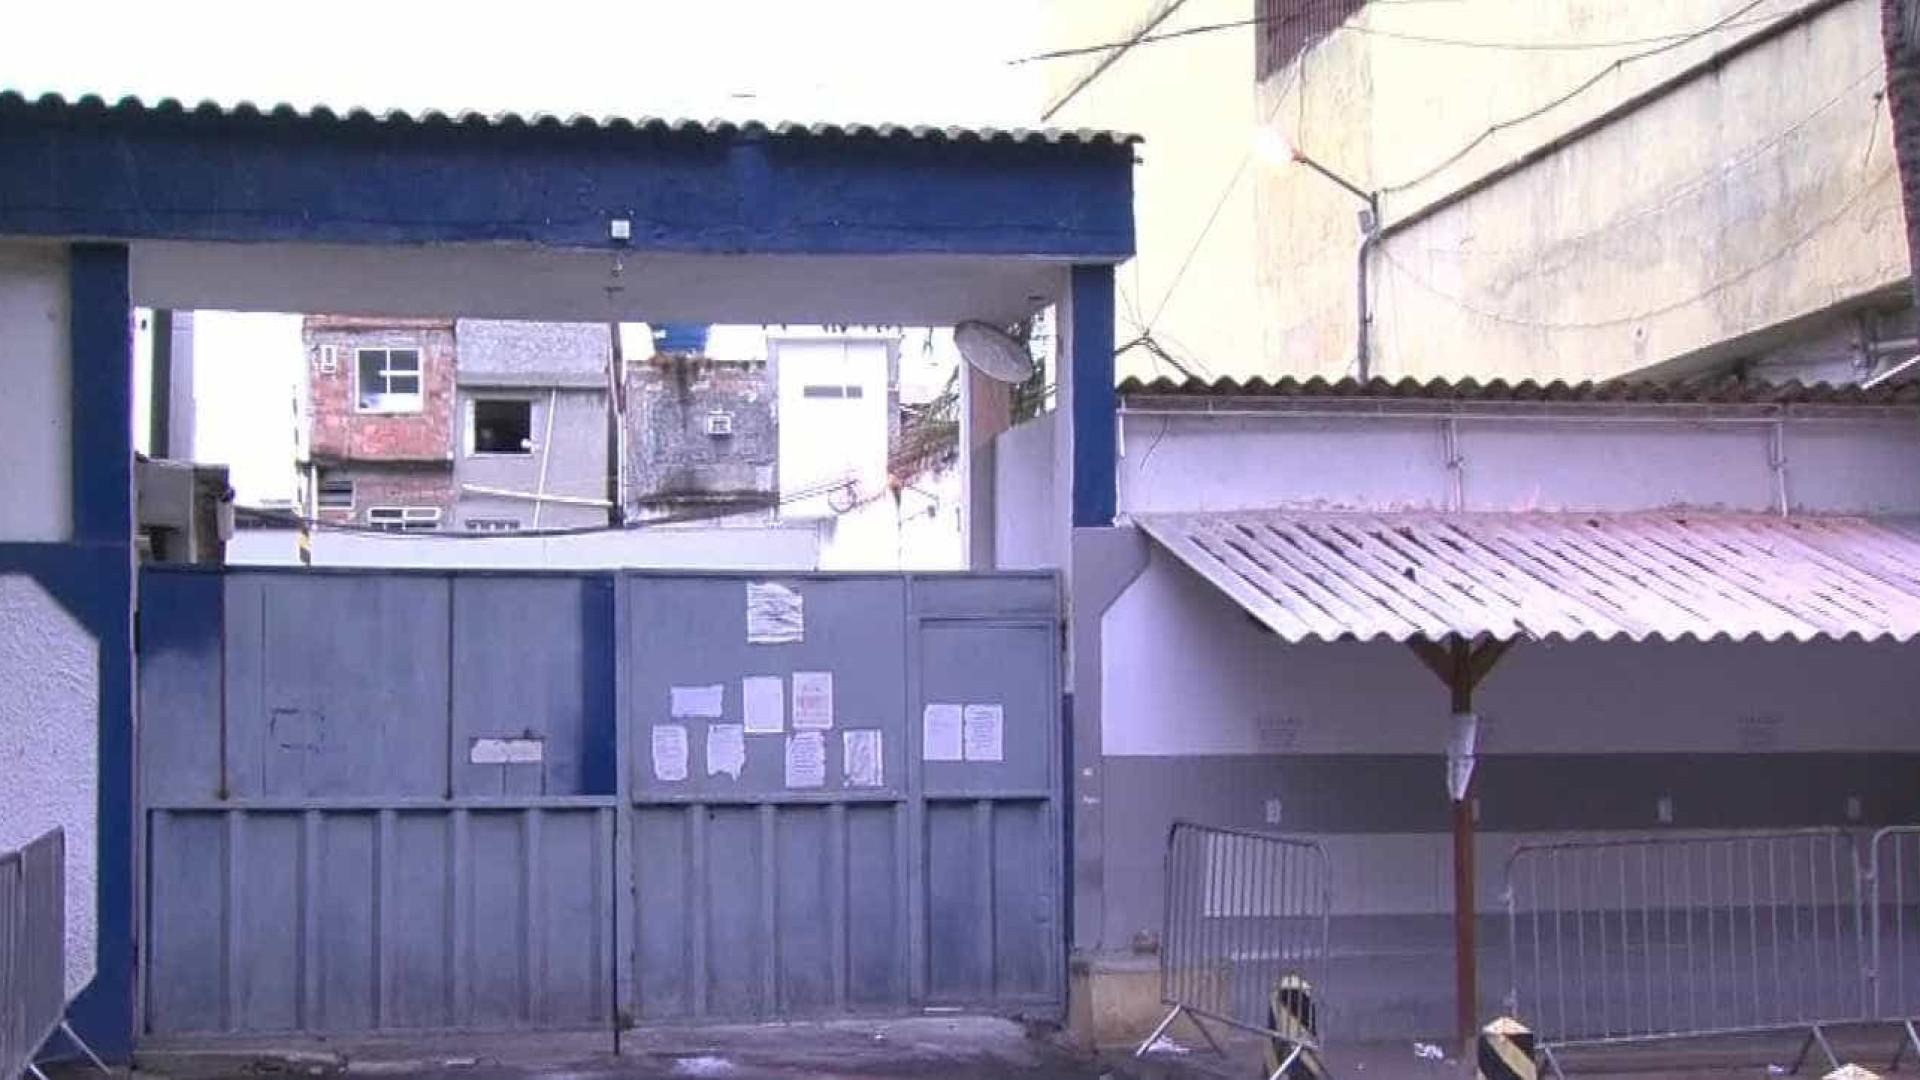 Presos da Lava Jato reclamam de baile funk perto da cadeia de Benfica